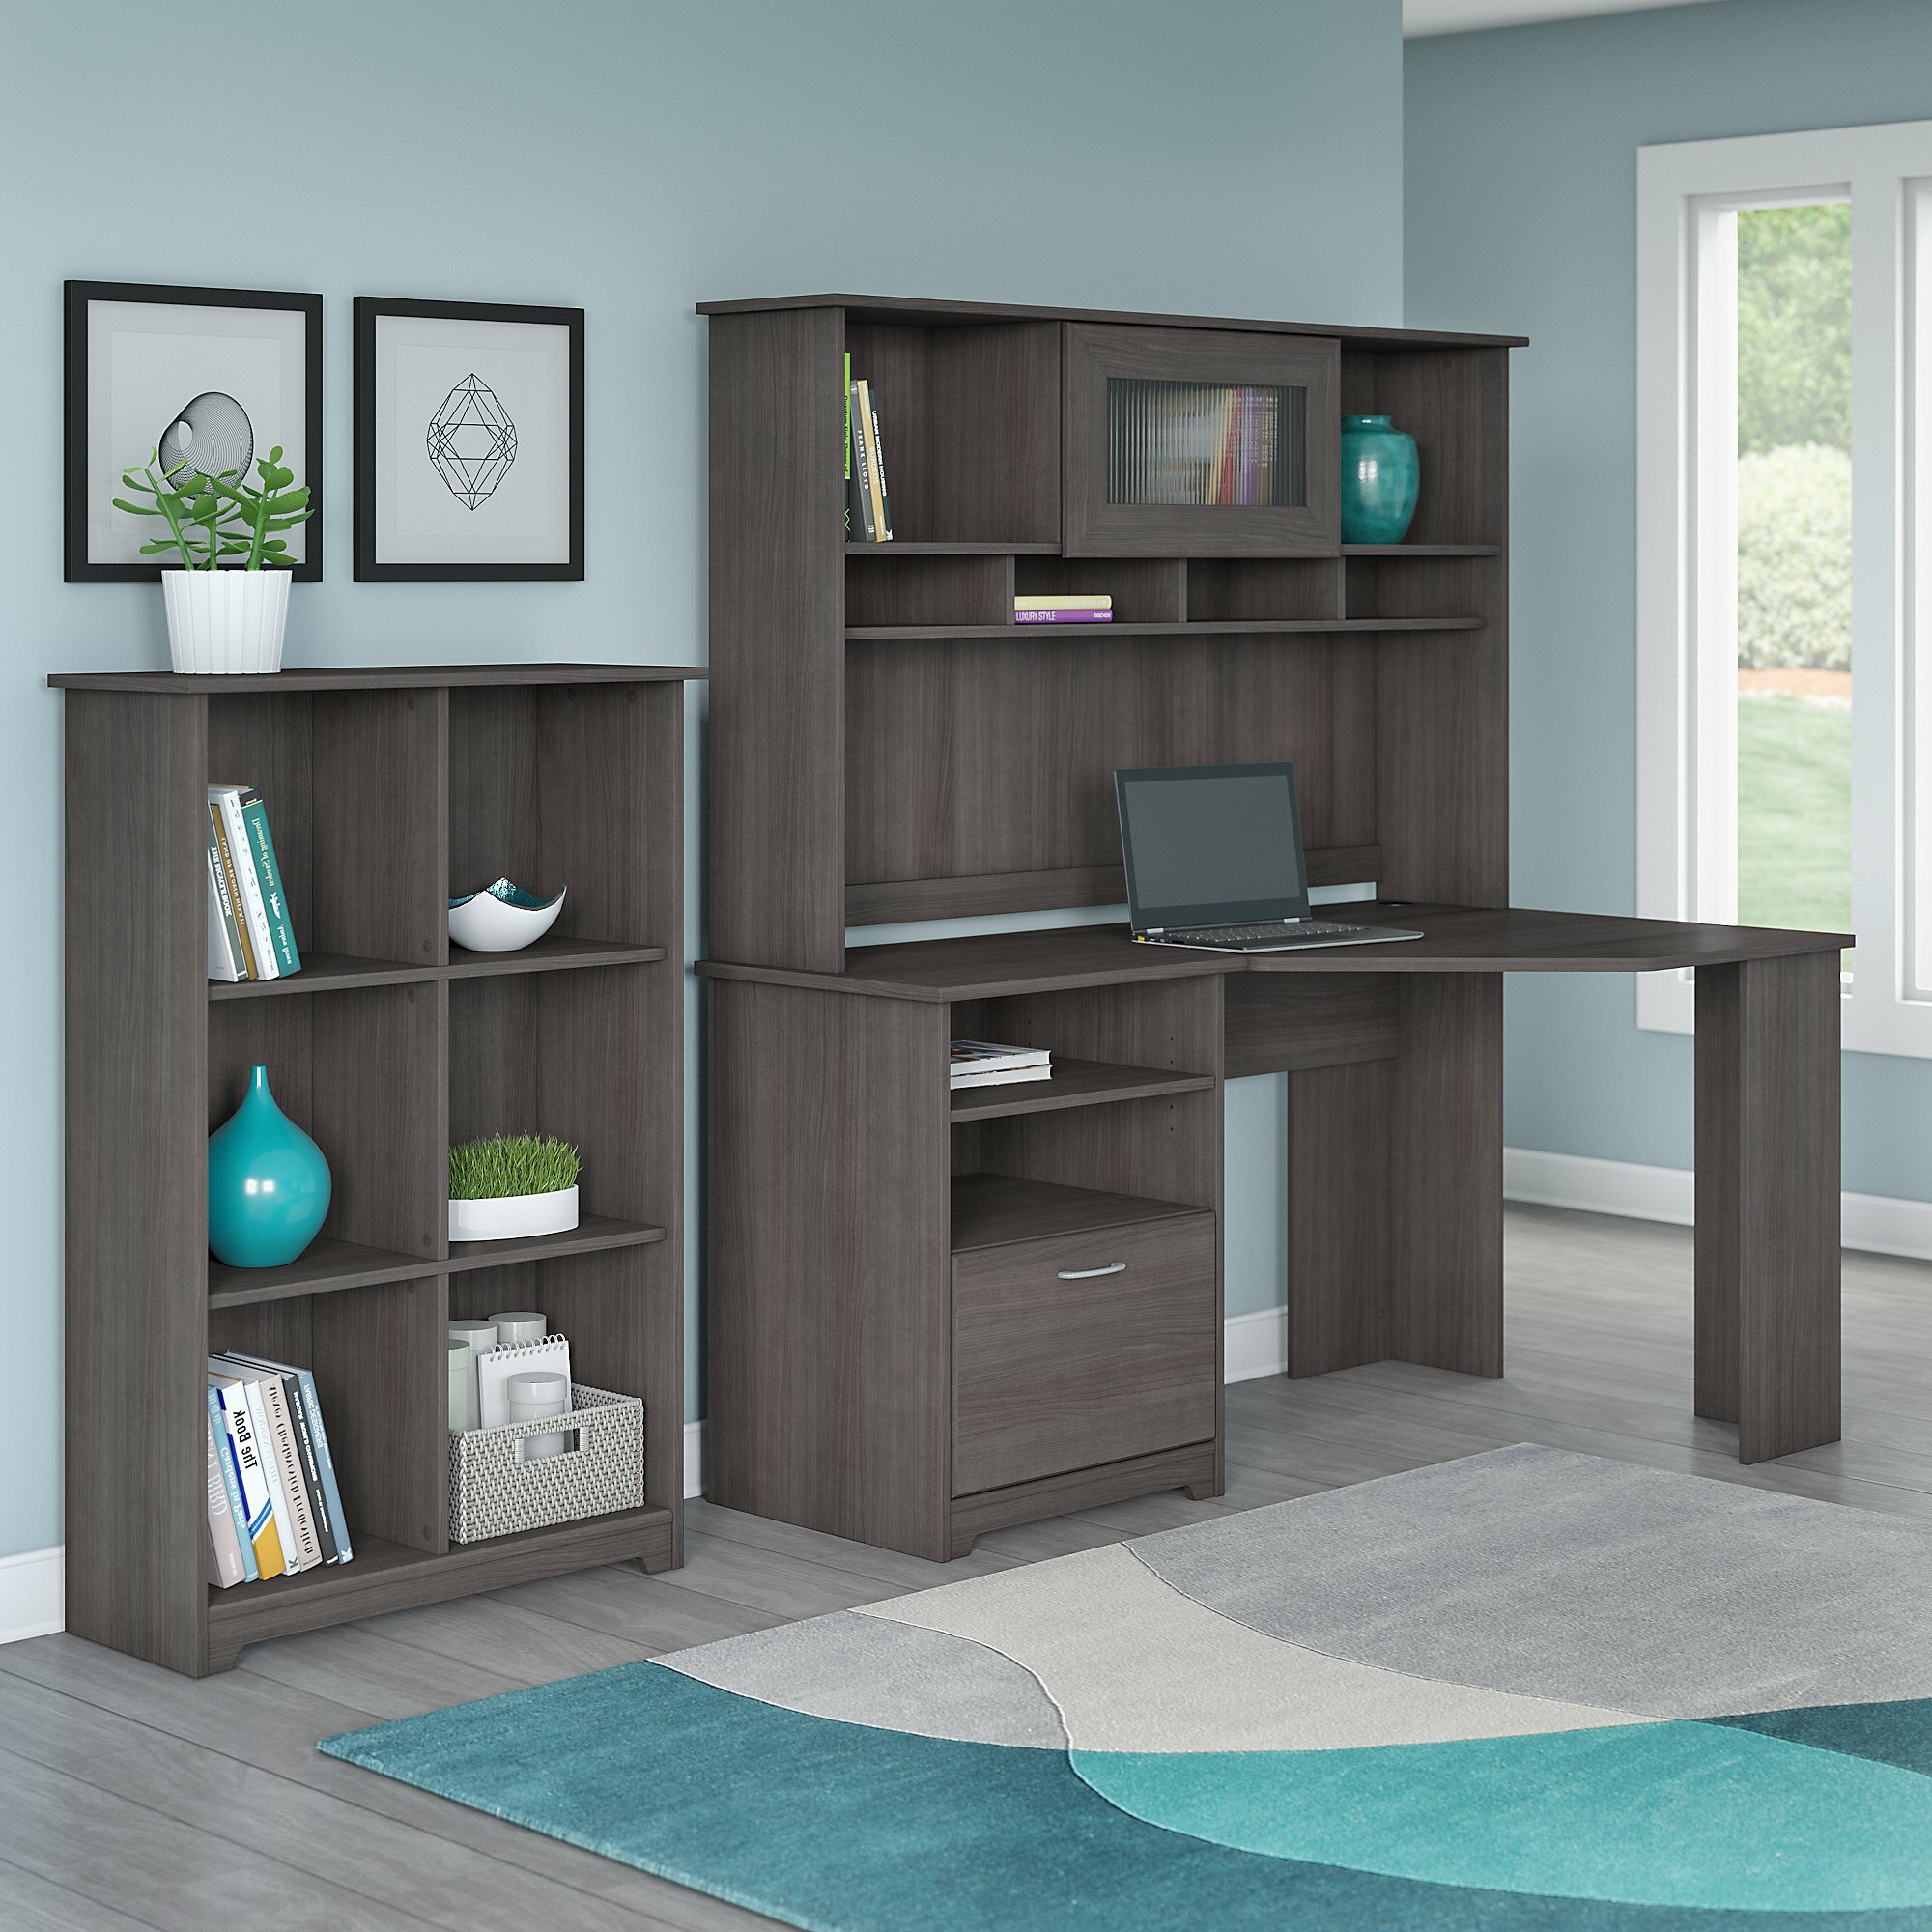 Red Barrel Studio Hillsdale Corner Desk With Hutch And 6 Cube Bookcase    Wayfair